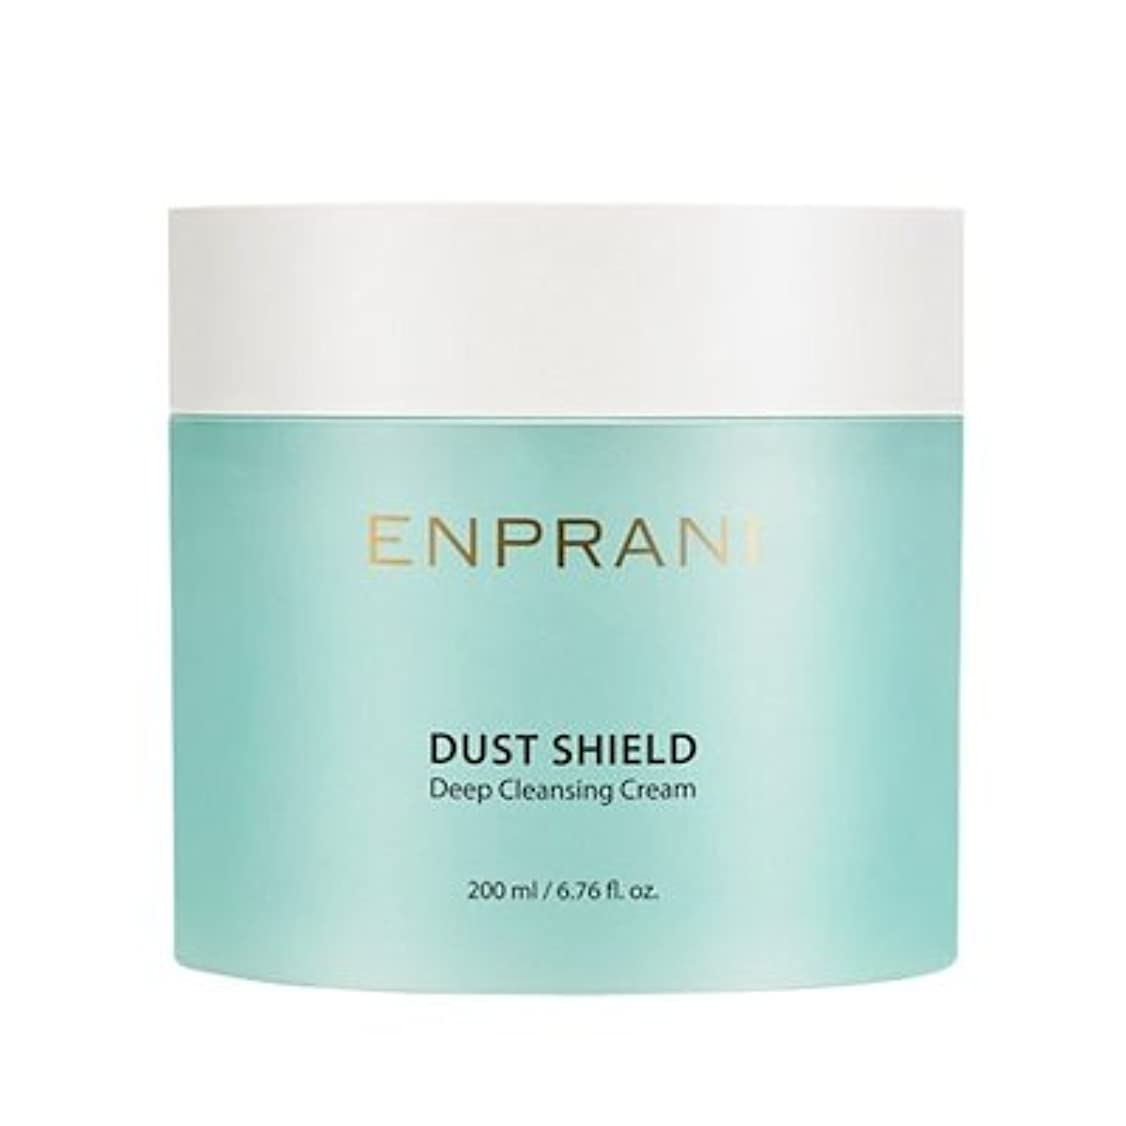 ENPRANI Dust Shield Deep Cleansing Cream エンプラニ ダストシールドディープクレンジングクリーム200ml [並行輸入品]